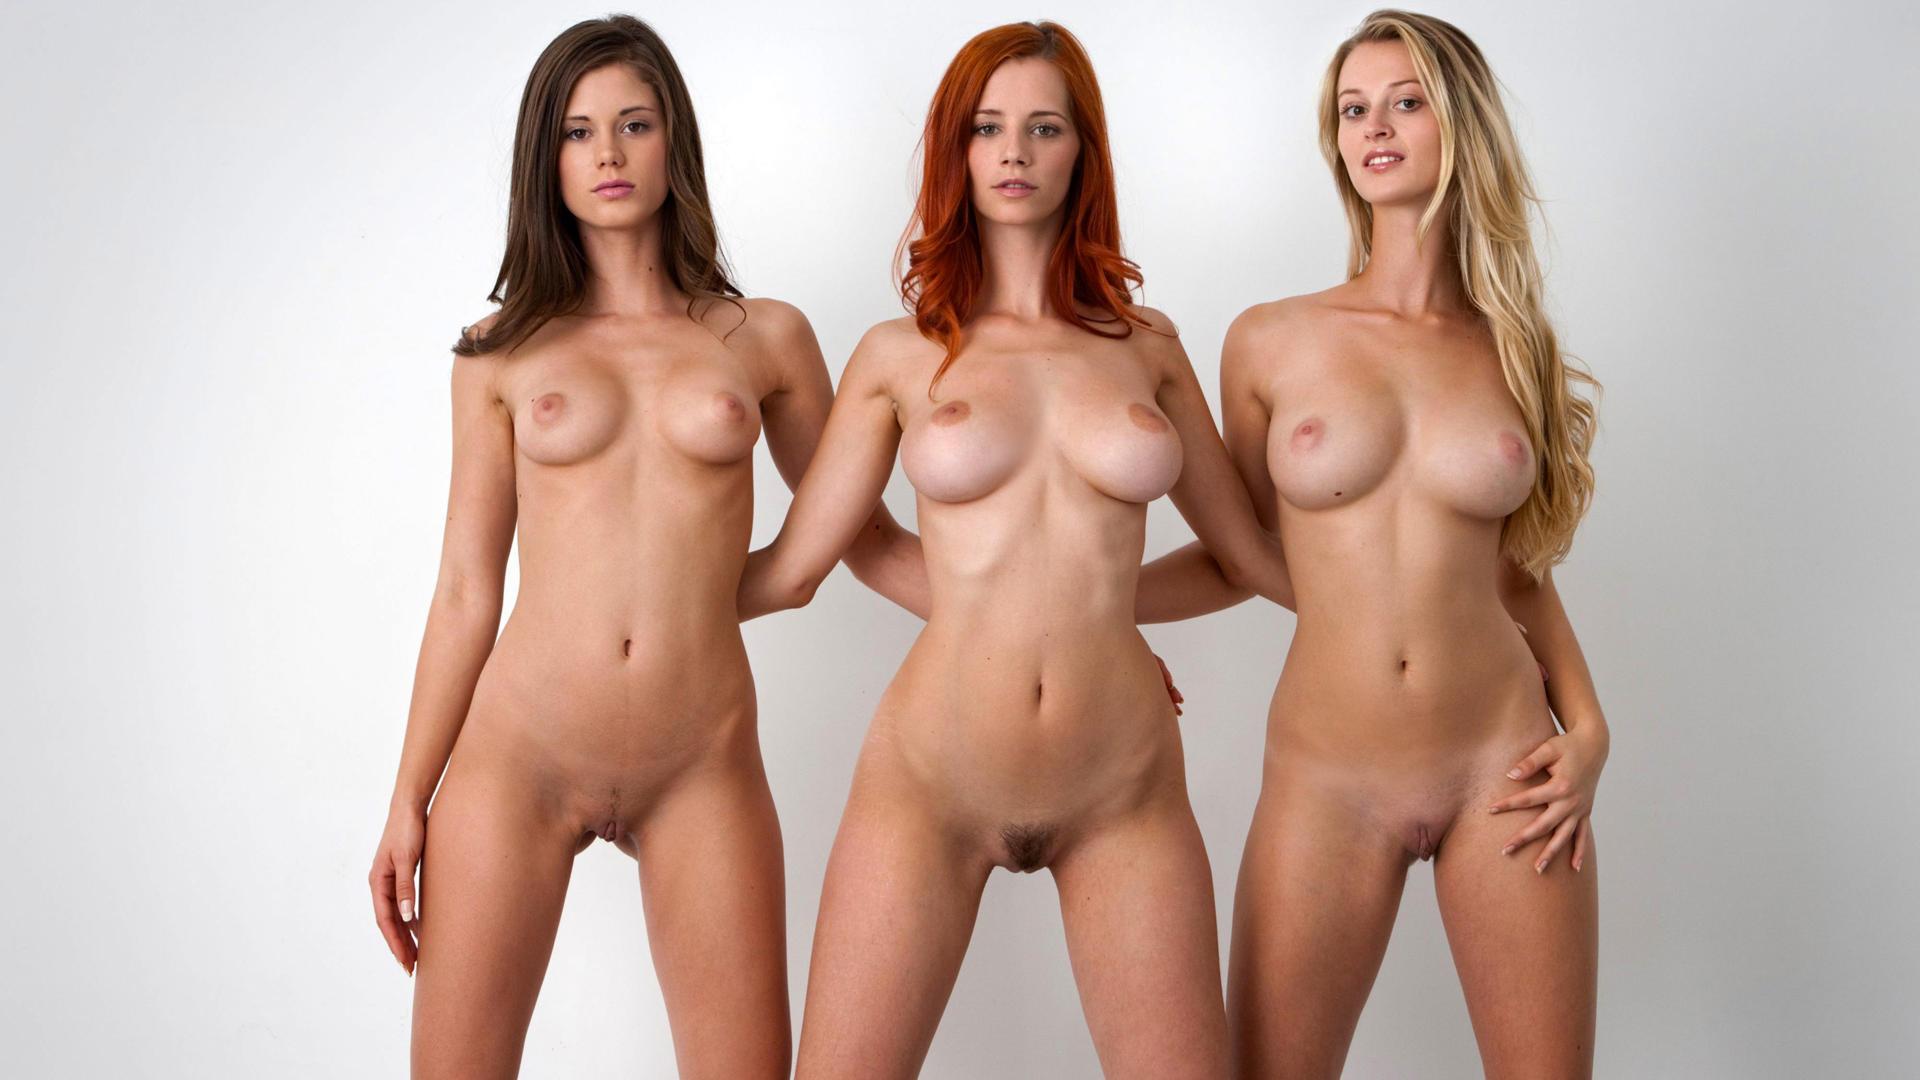 download photo 1920x1080, carisha, nude, sexy, three, boobs, caprice